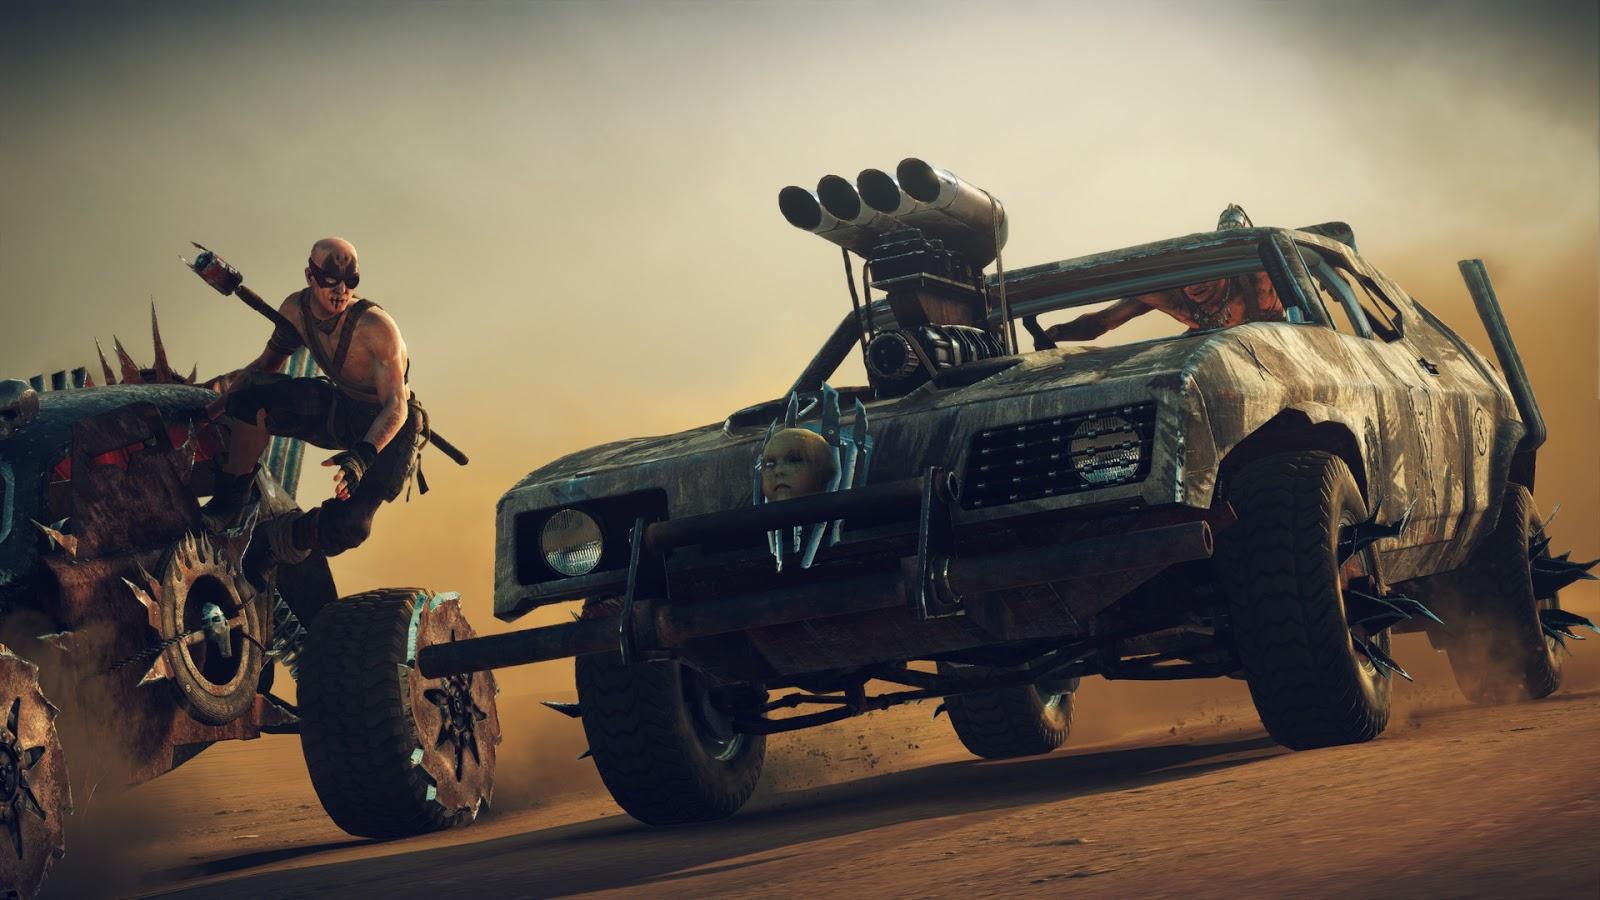 Mad Max ESPAÑOL PC Descargar Full (CPY) + REPACK 6 DVD5 (JPW) 6